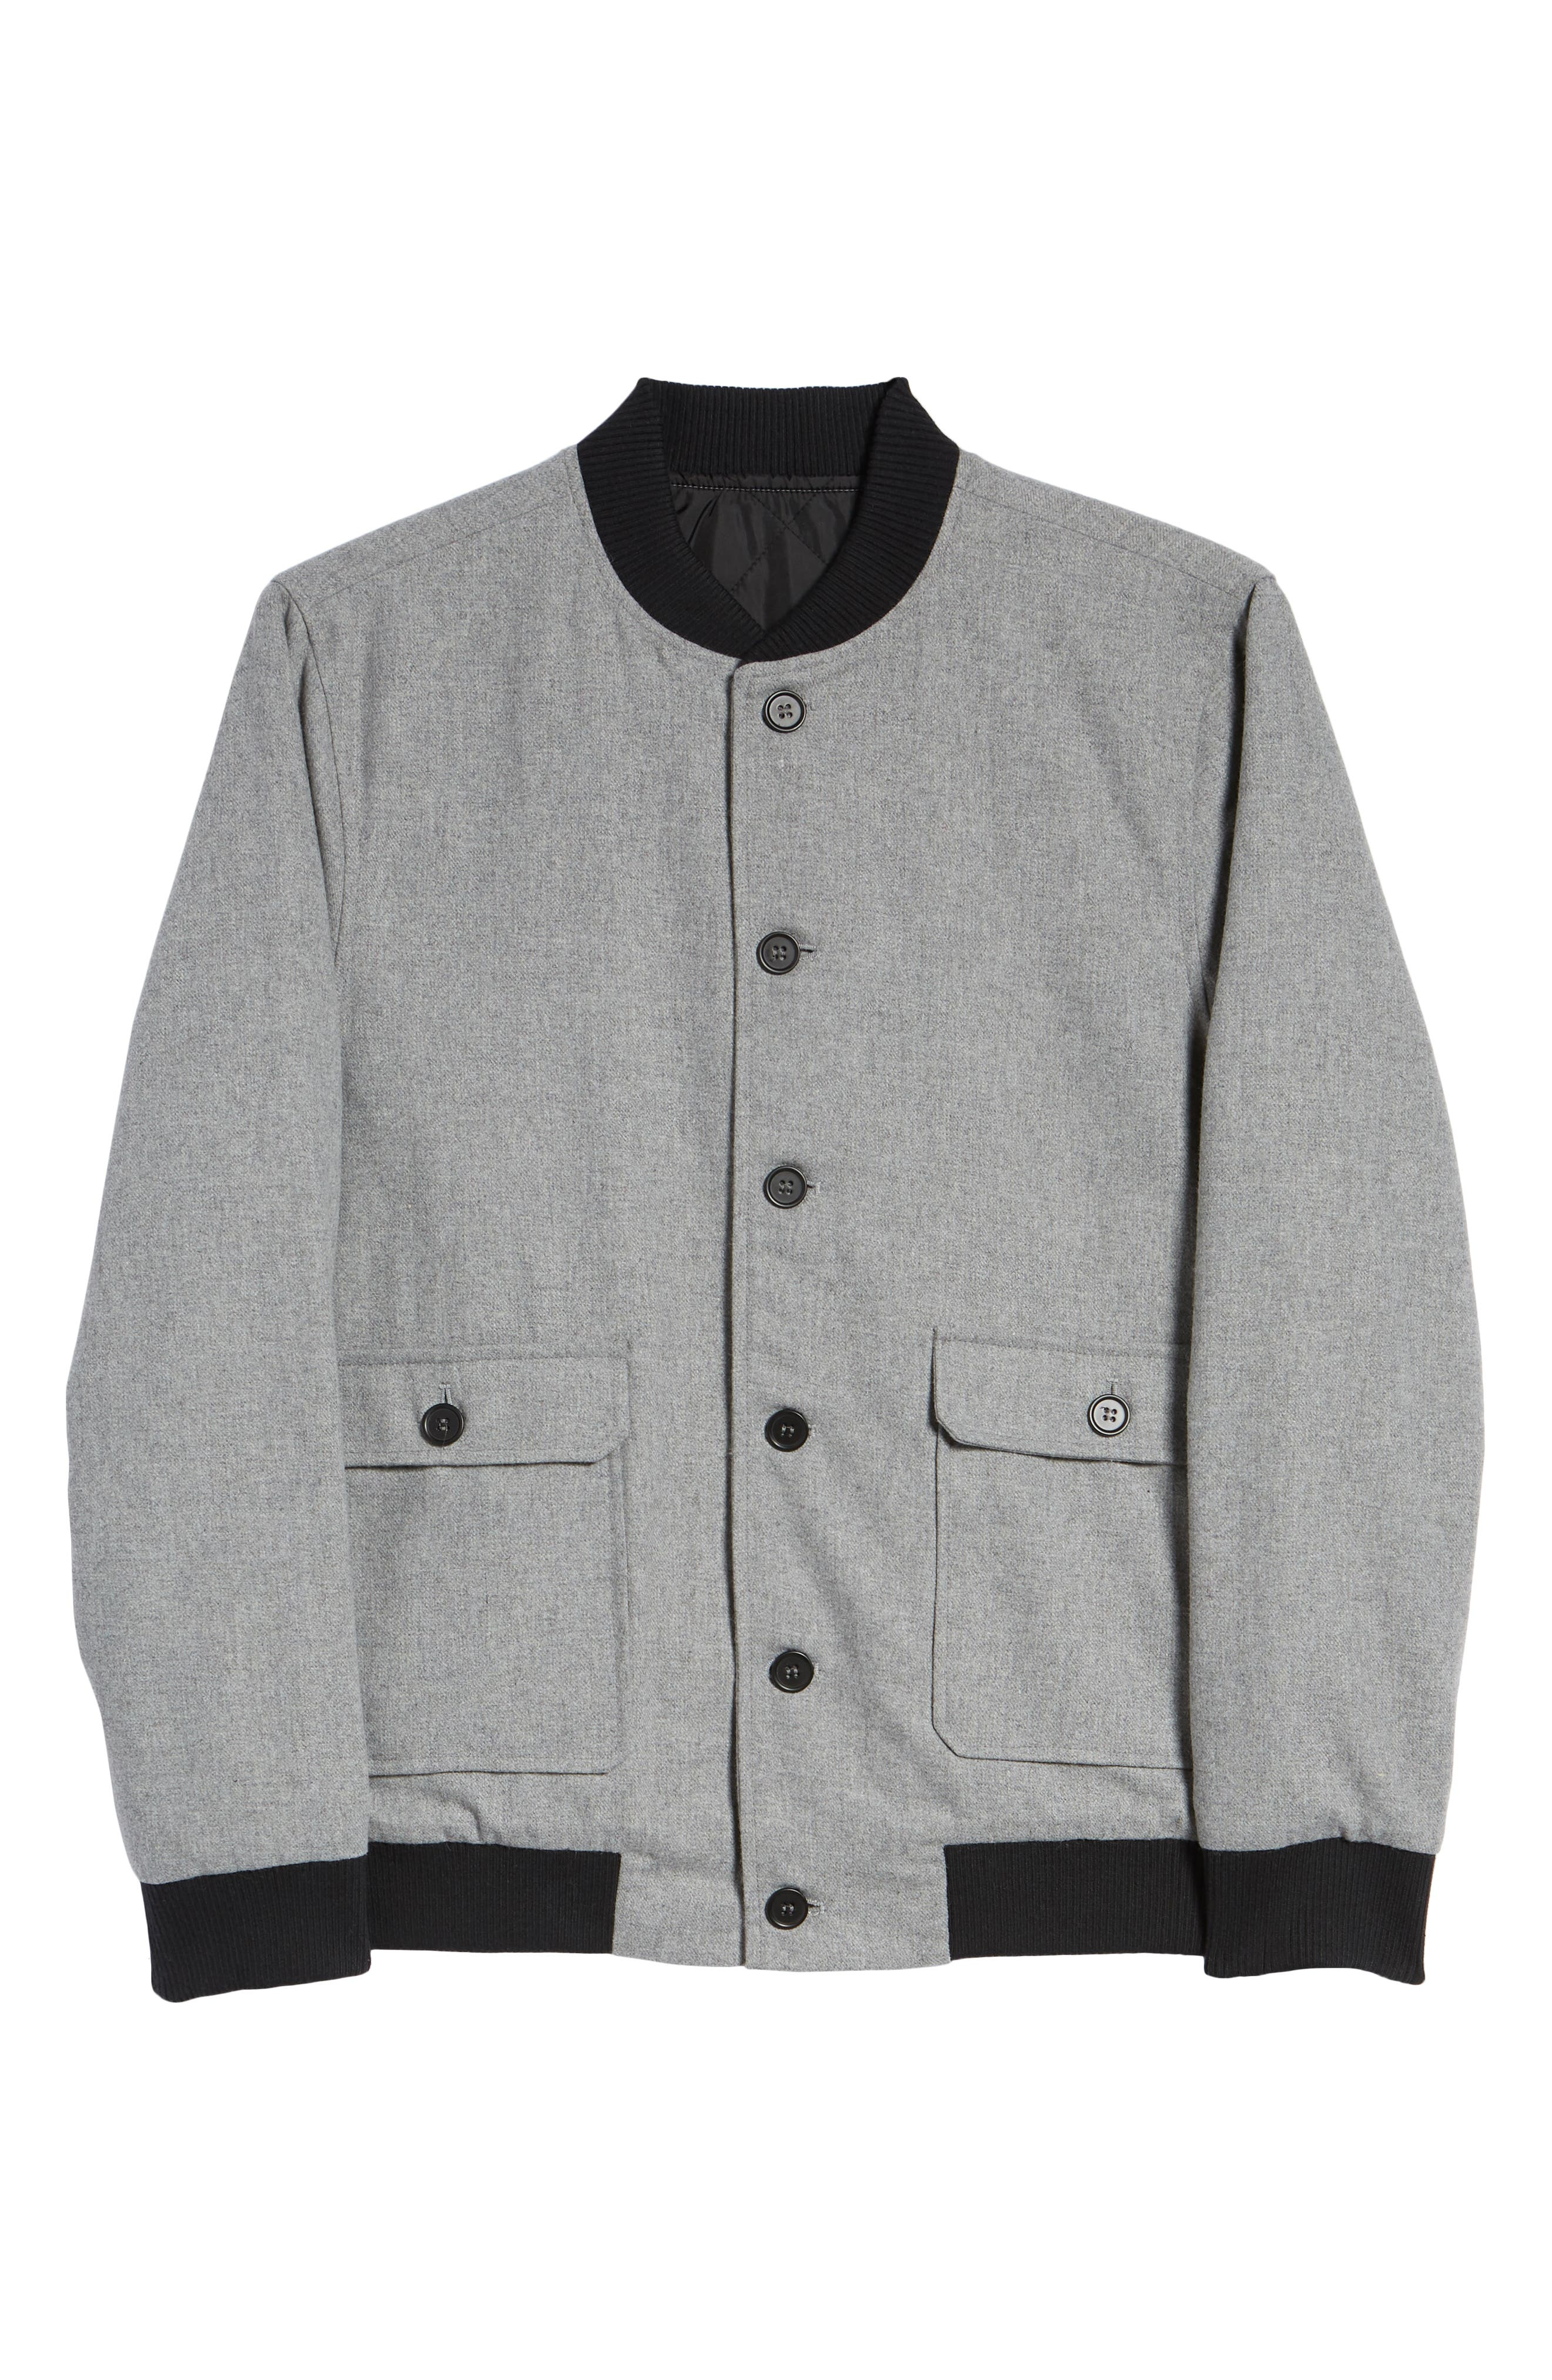 Button Front Bomber Jacket,                             Alternate thumbnail 6, color,                             GREY TORNADO HEATHER